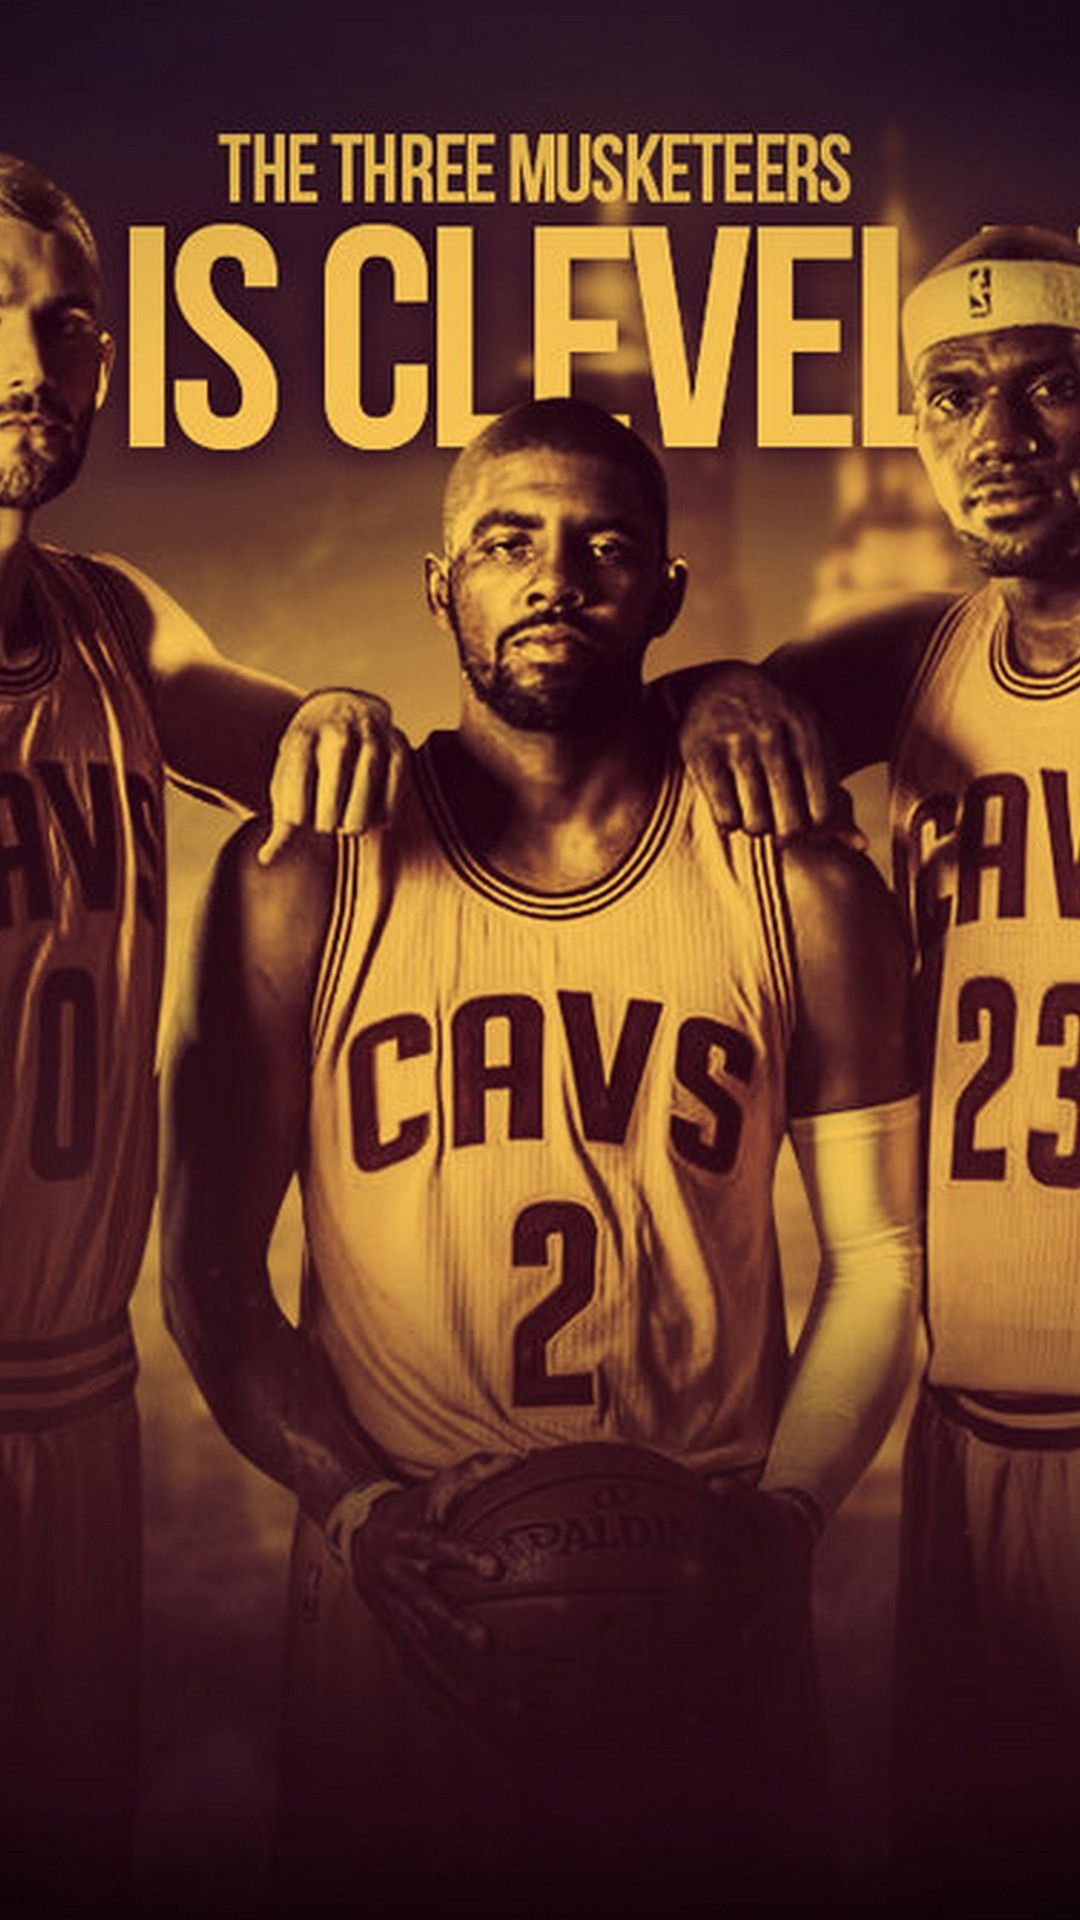 Basketball Wallpaper Best Basketball Wallpapers 2020 Cavaliers Nba Basketball Senior Pictures Basketball Wallpaper